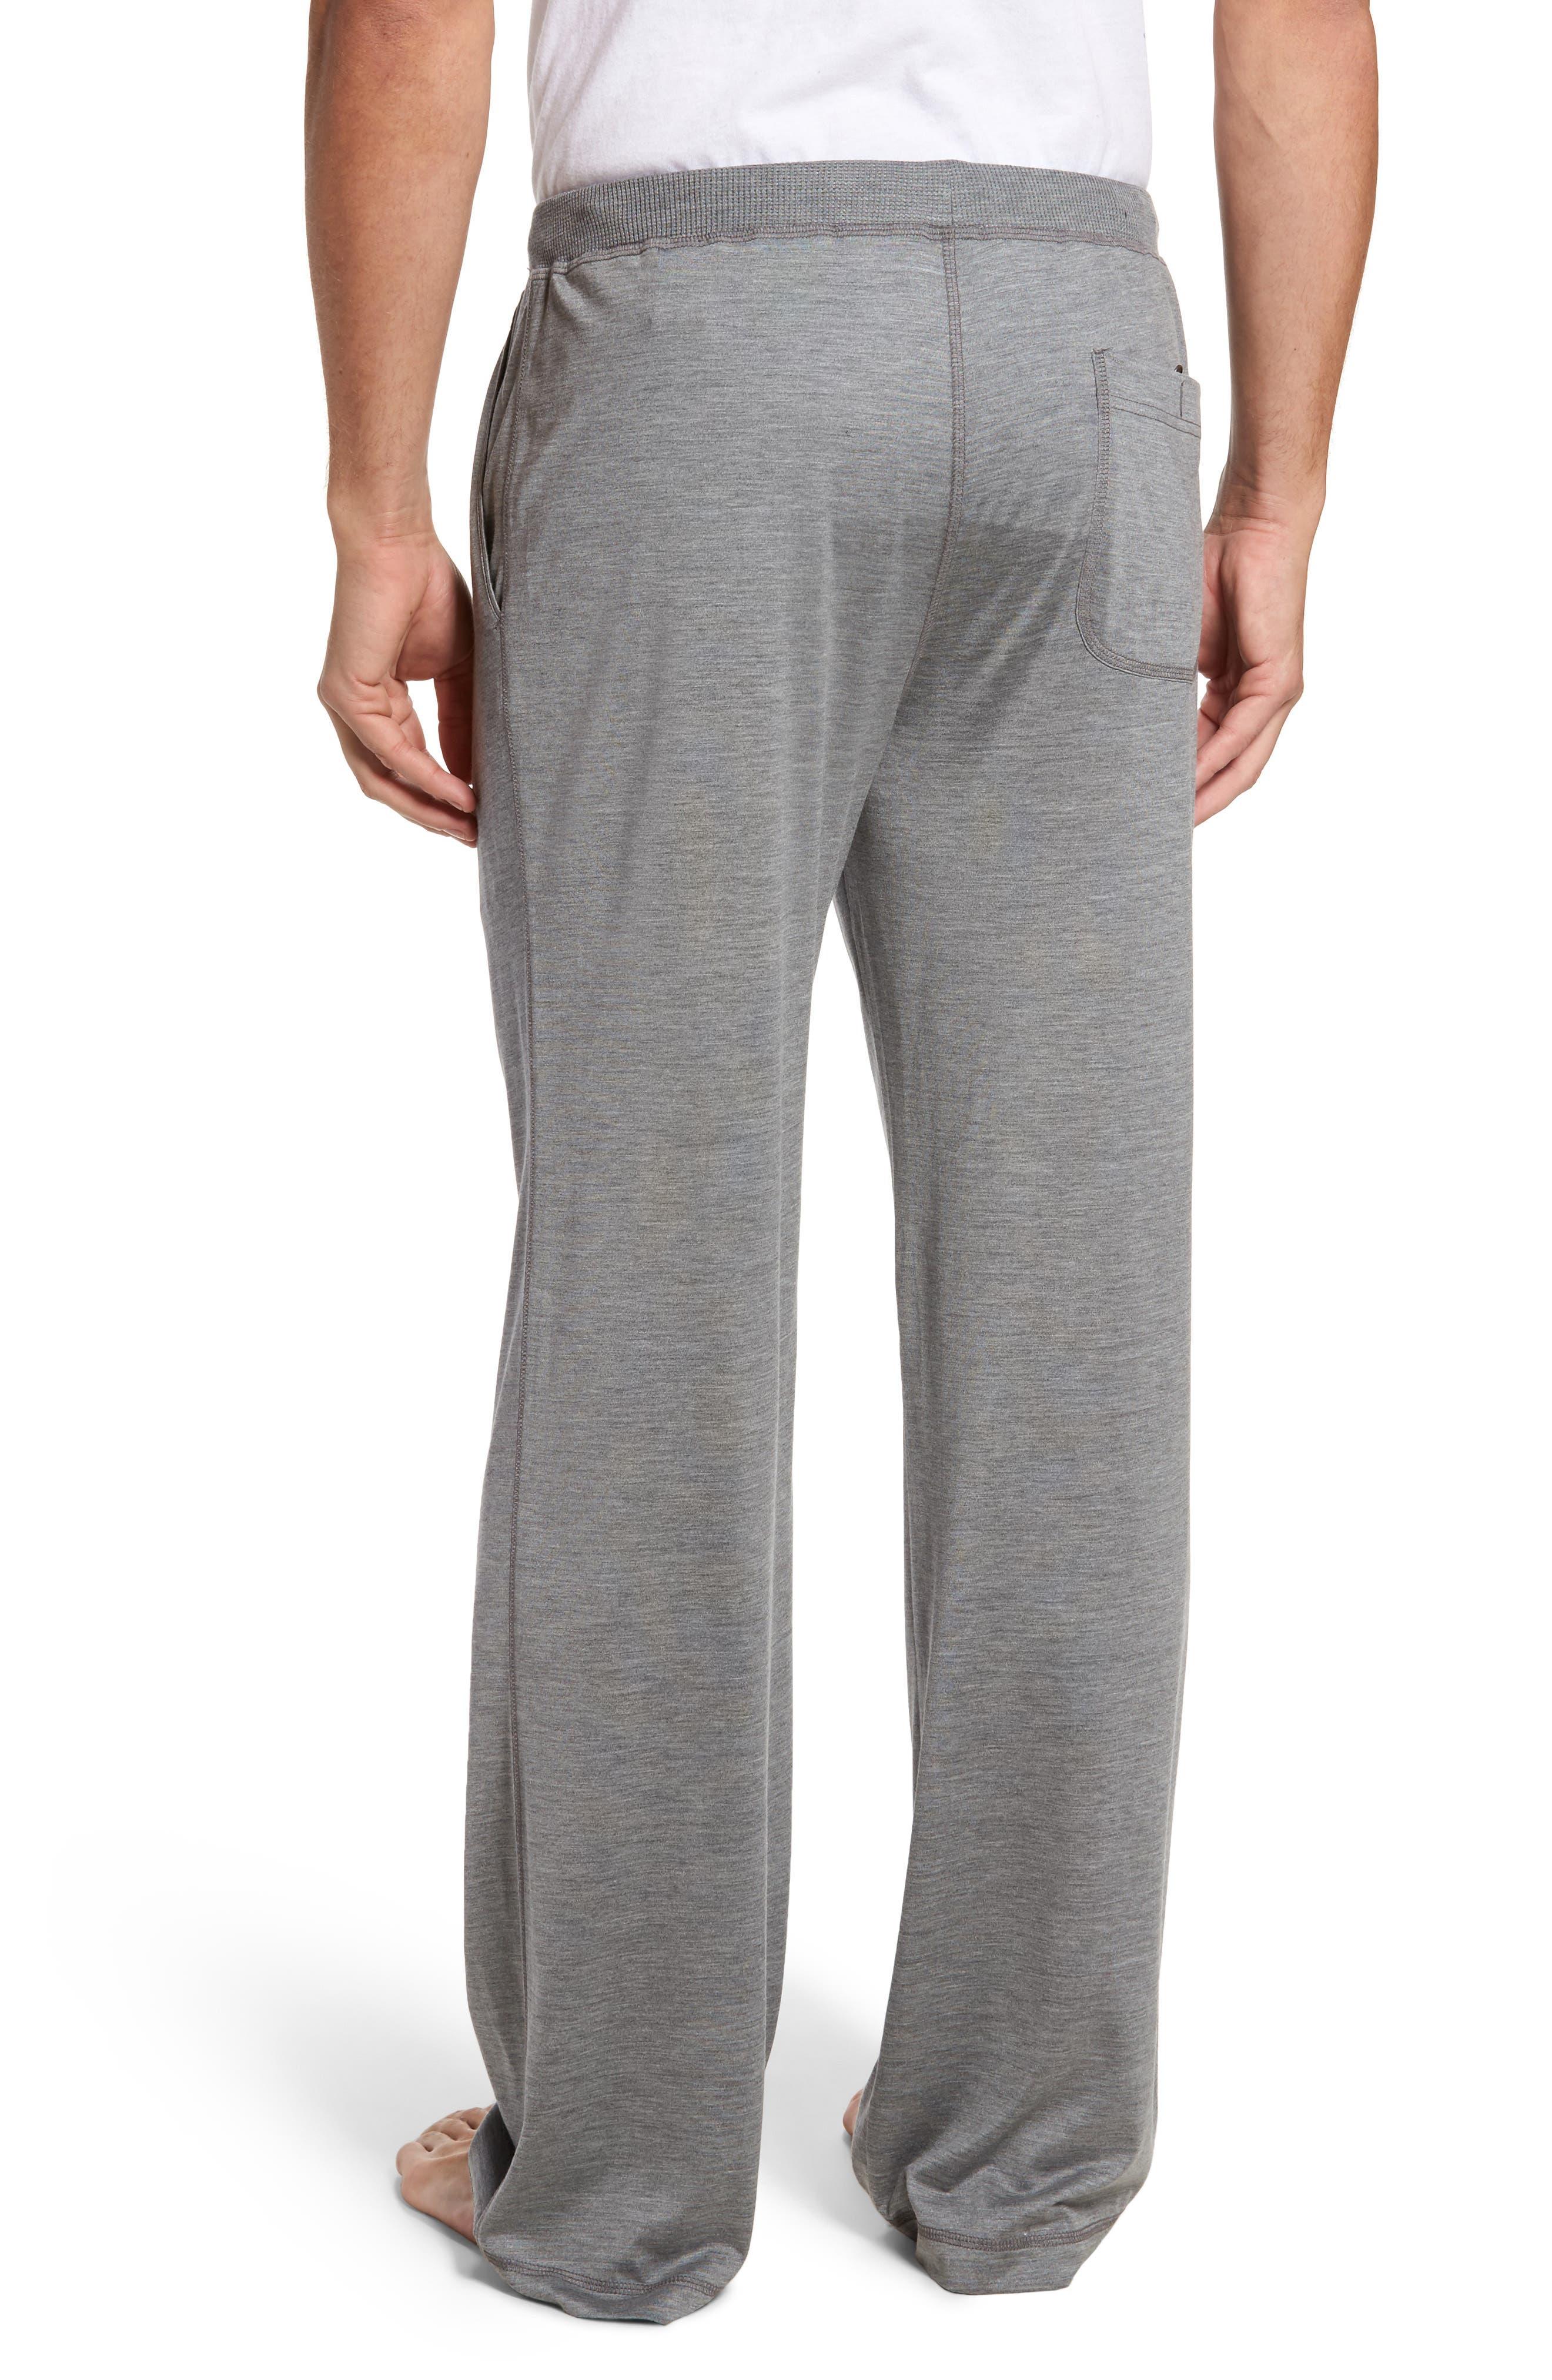 Silk & Cotton Lounge Pants,                             Alternate thumbnail 2, color,                             CHARCOAL HEATHER